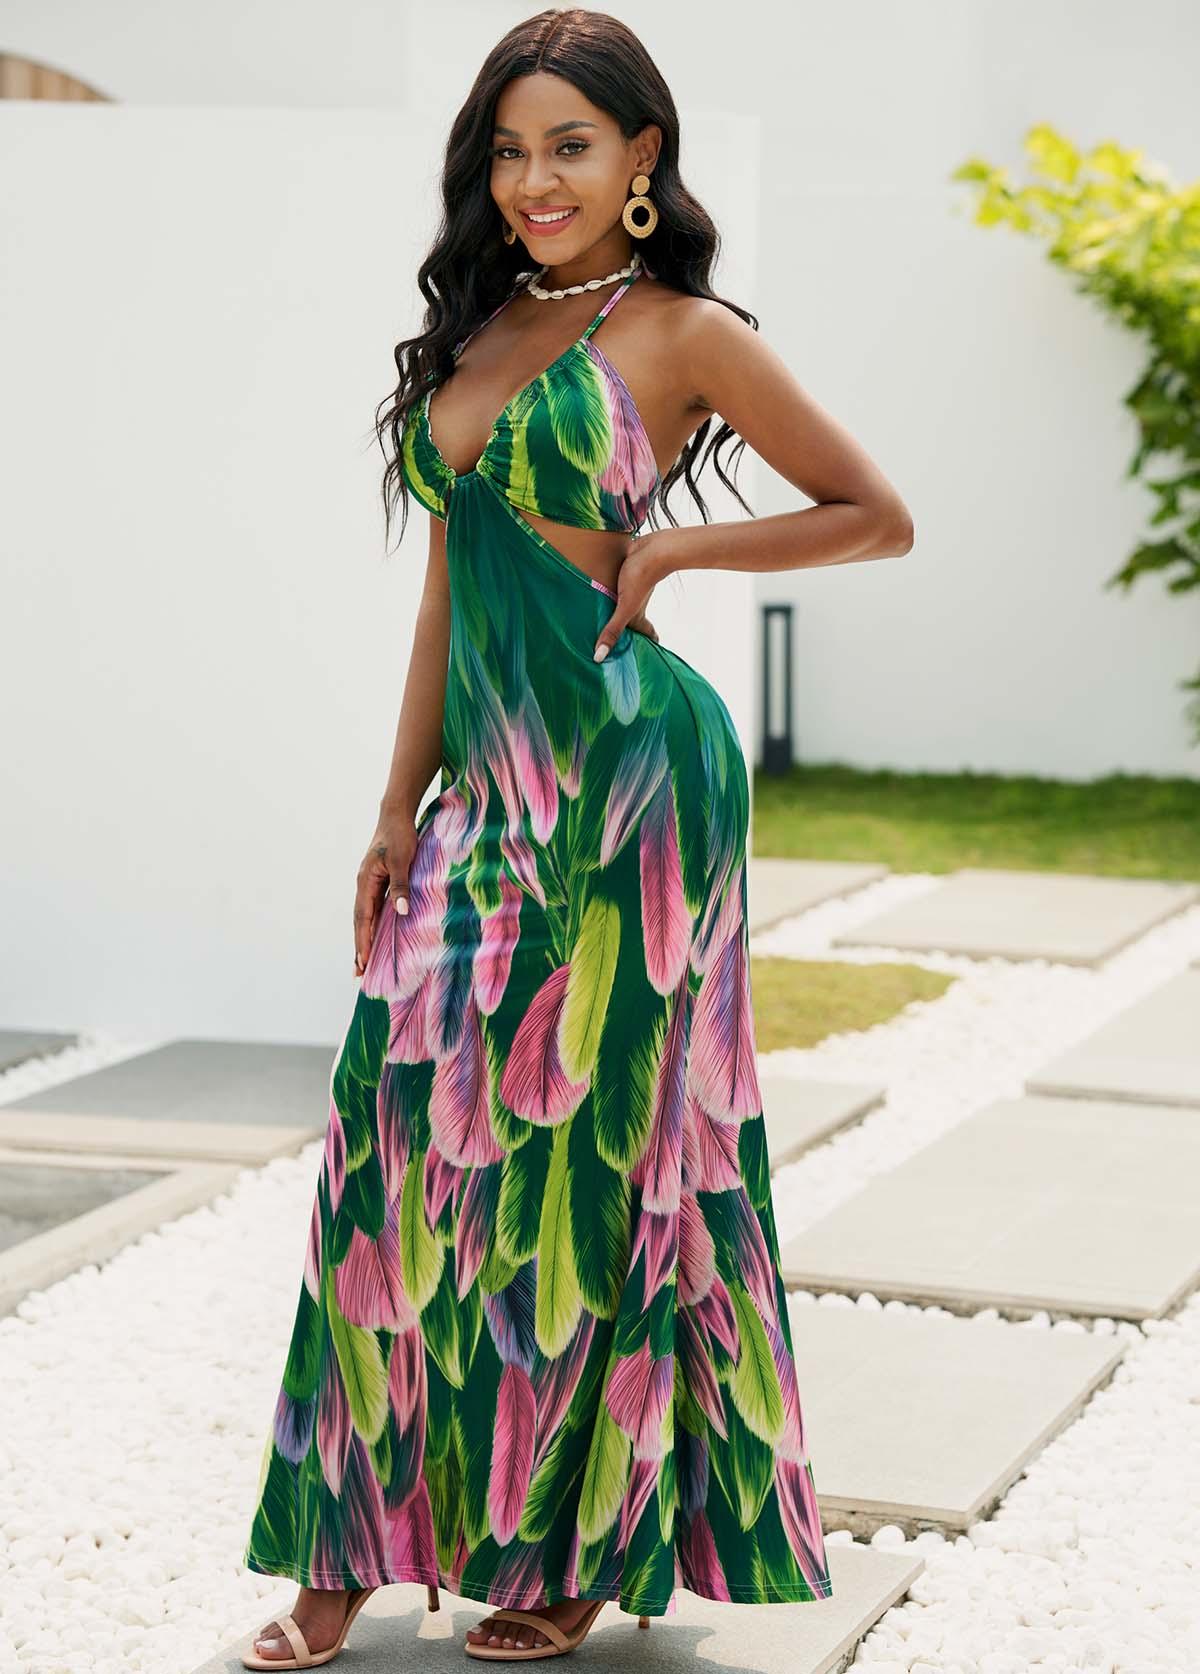 Cutout Feathers Print Halter Maxi Dress